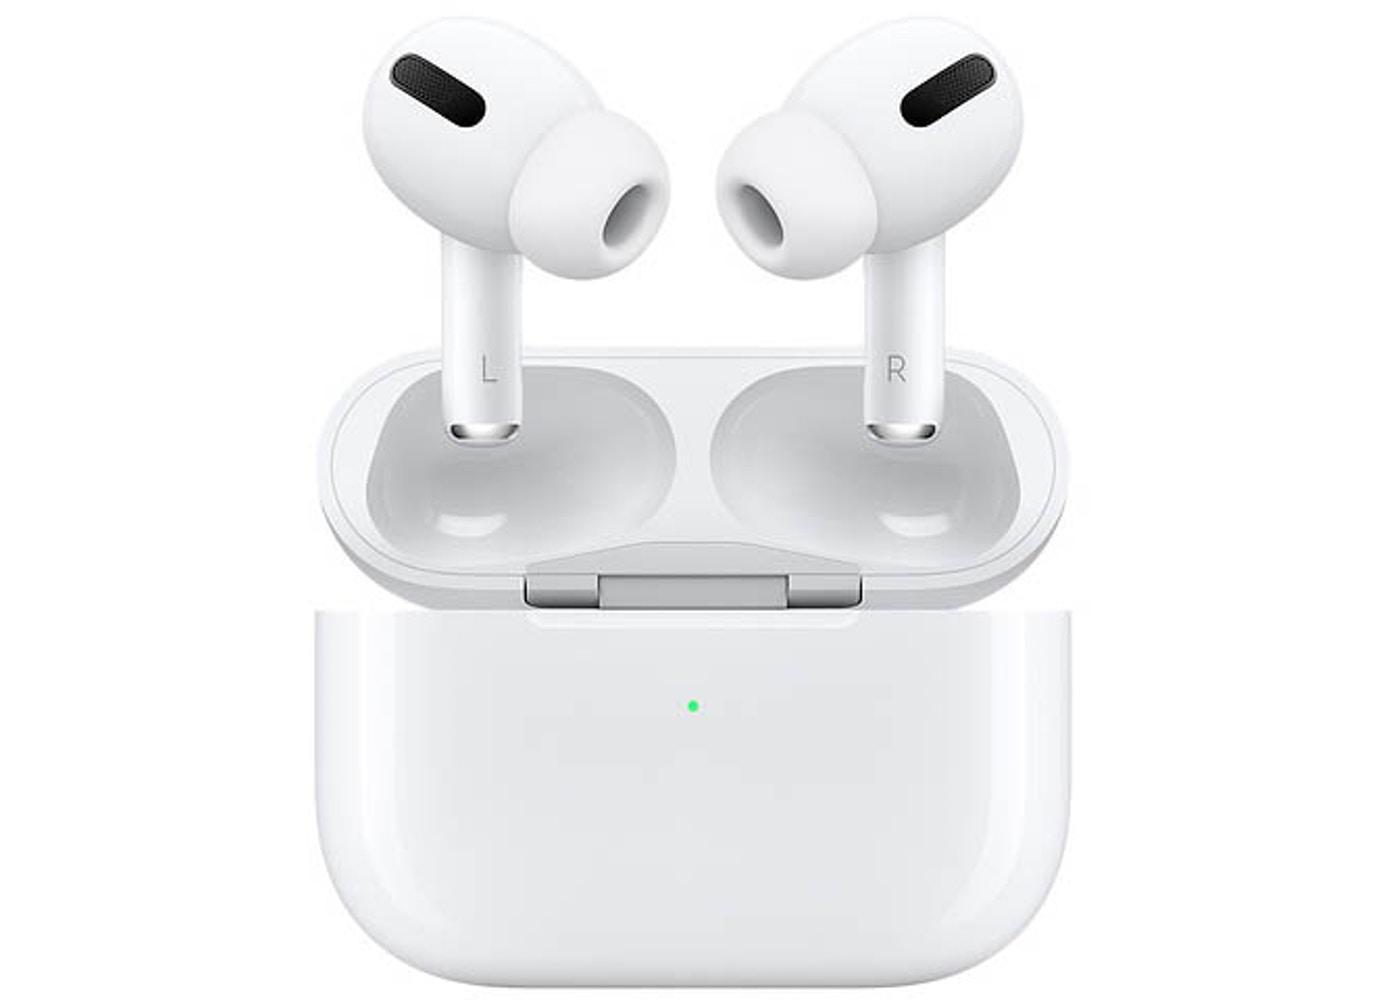 Casti Apple AirPods Pro - imaginea 1